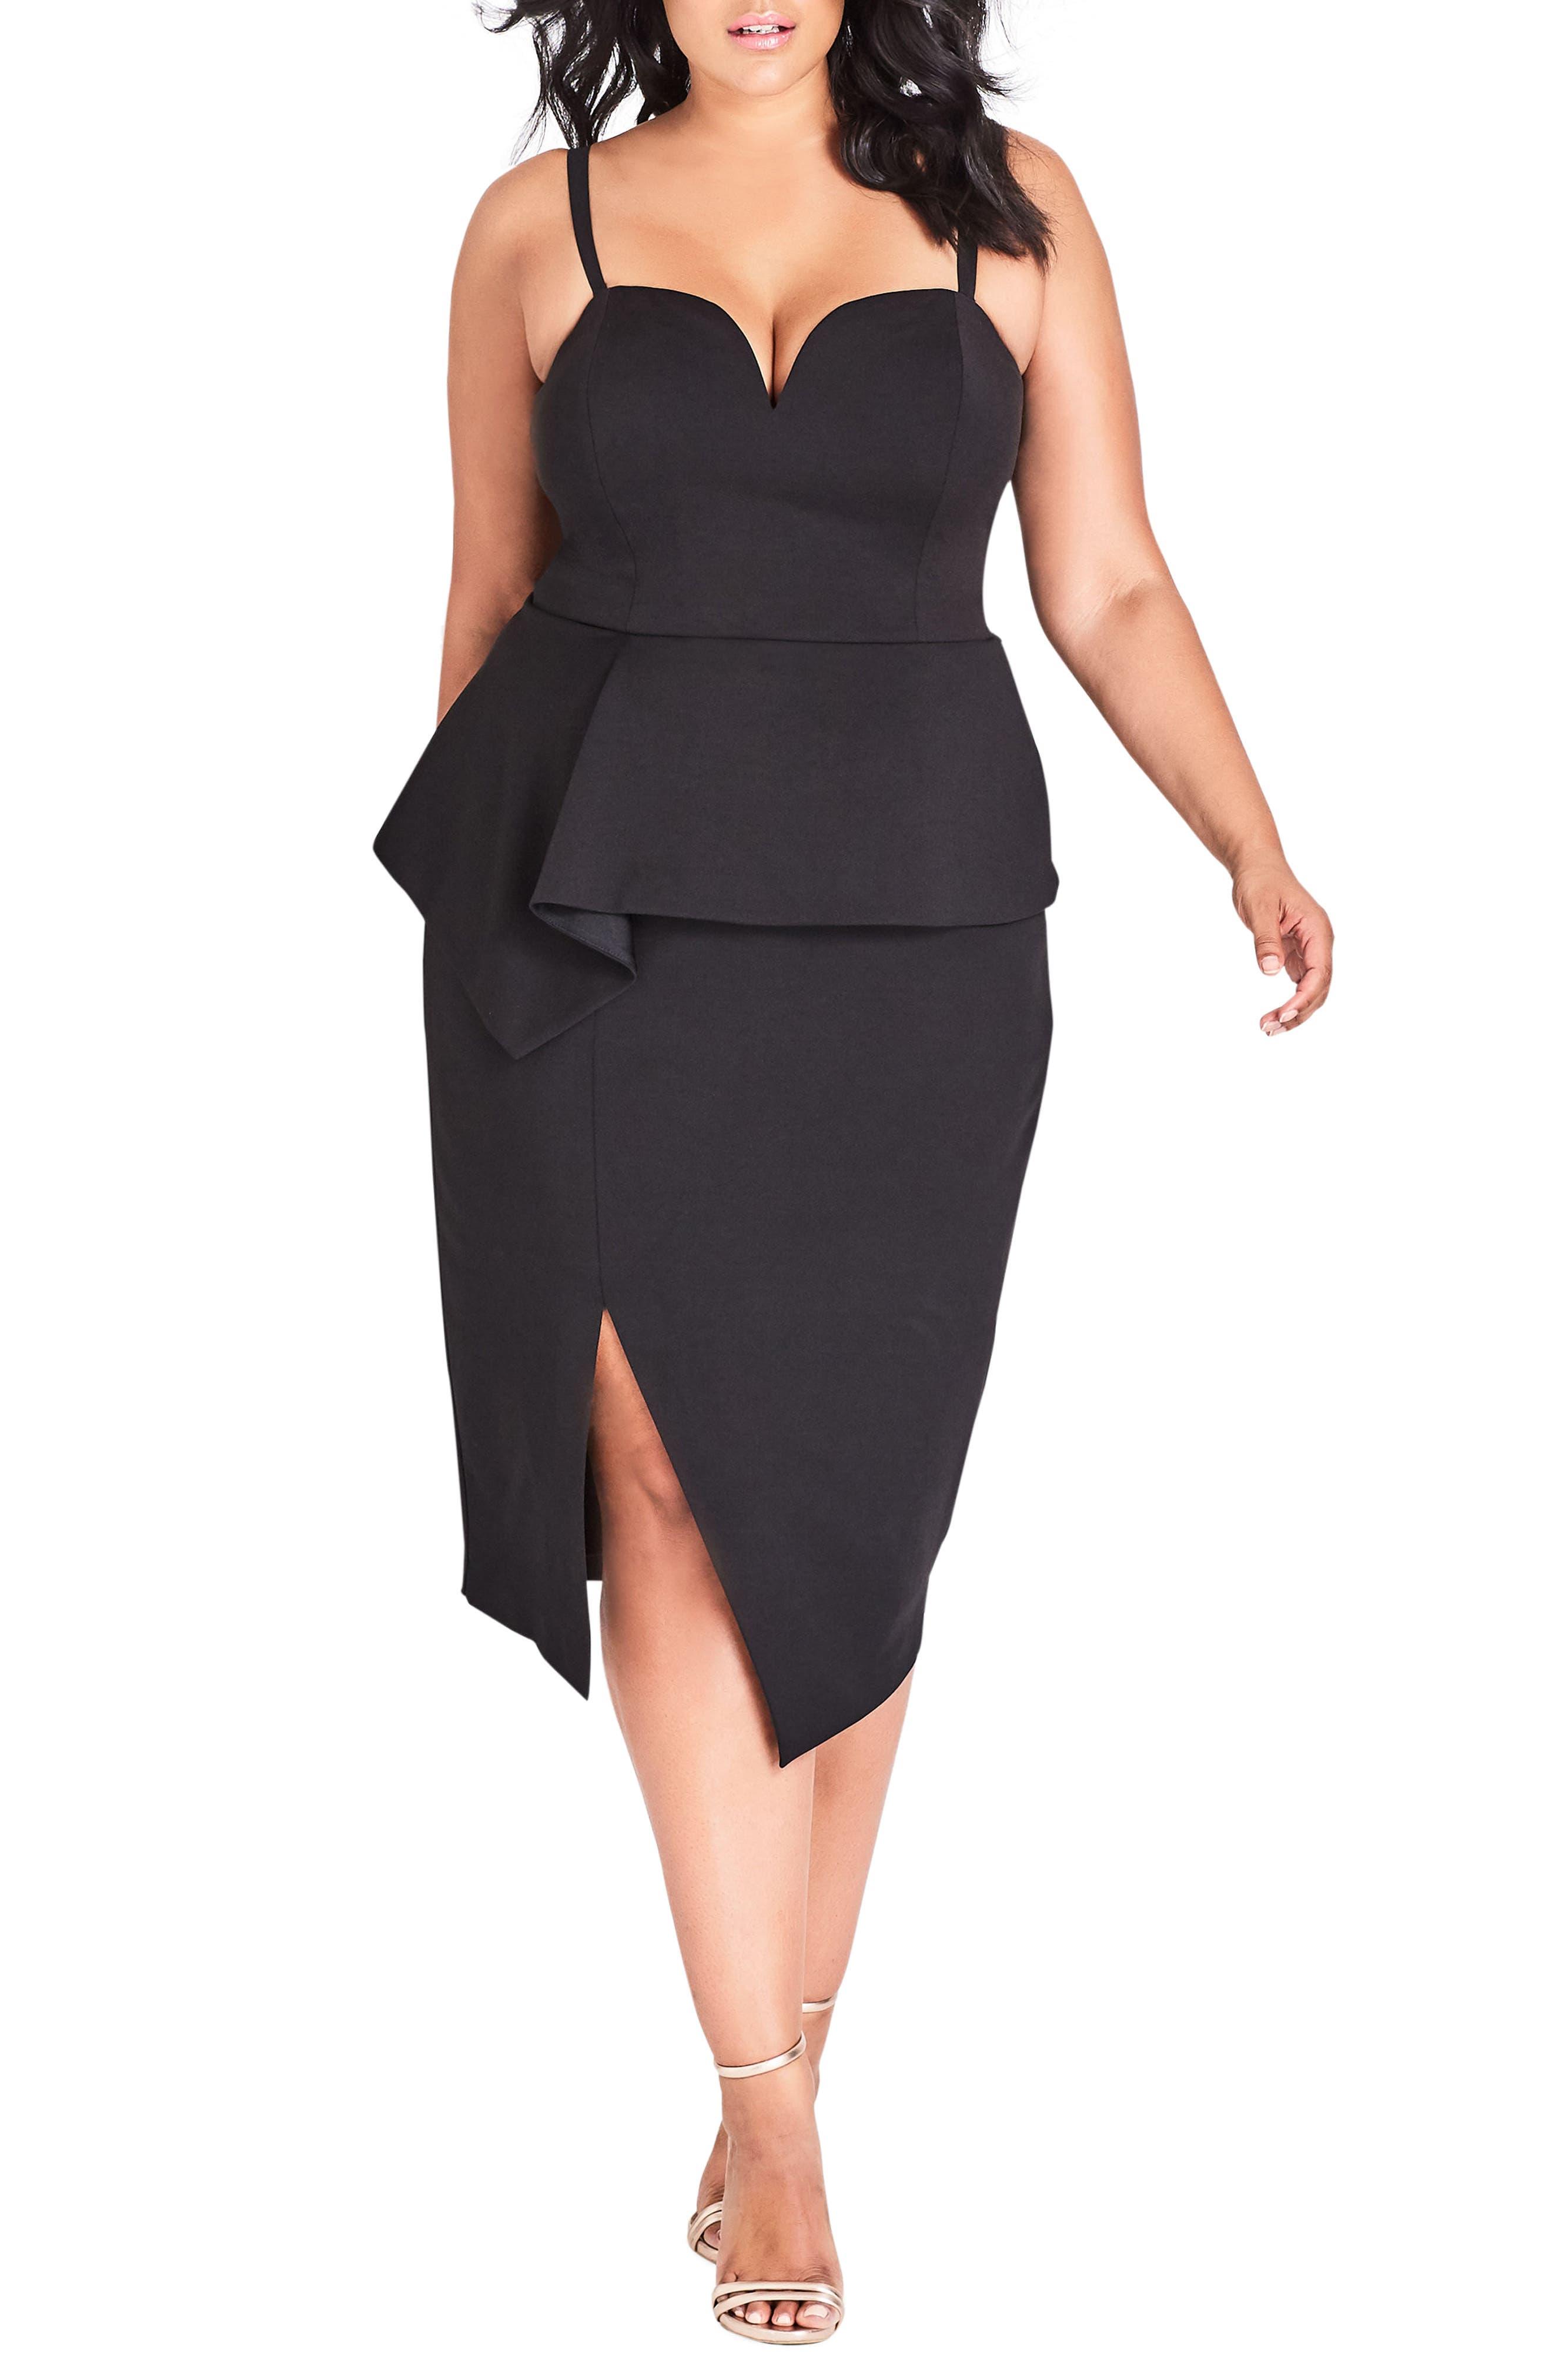 Screen Siren Dress,                         Main,                         color, Black